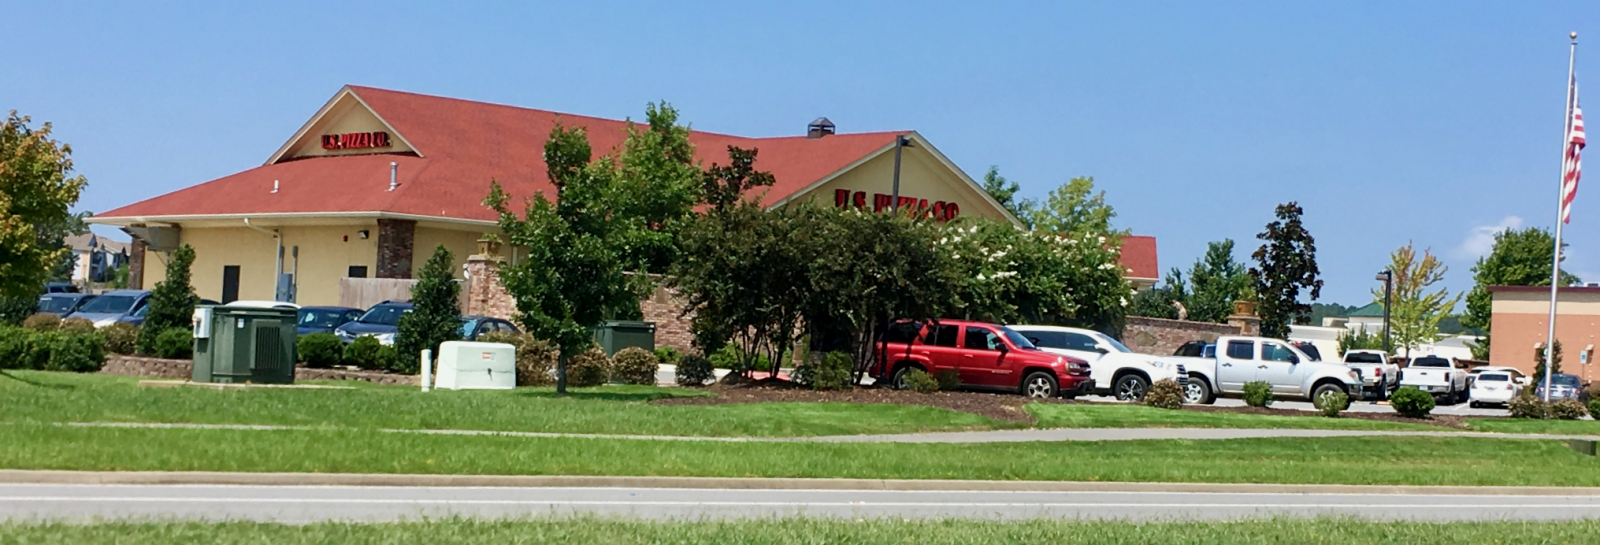 U.S. Pizza Company, Maumelle